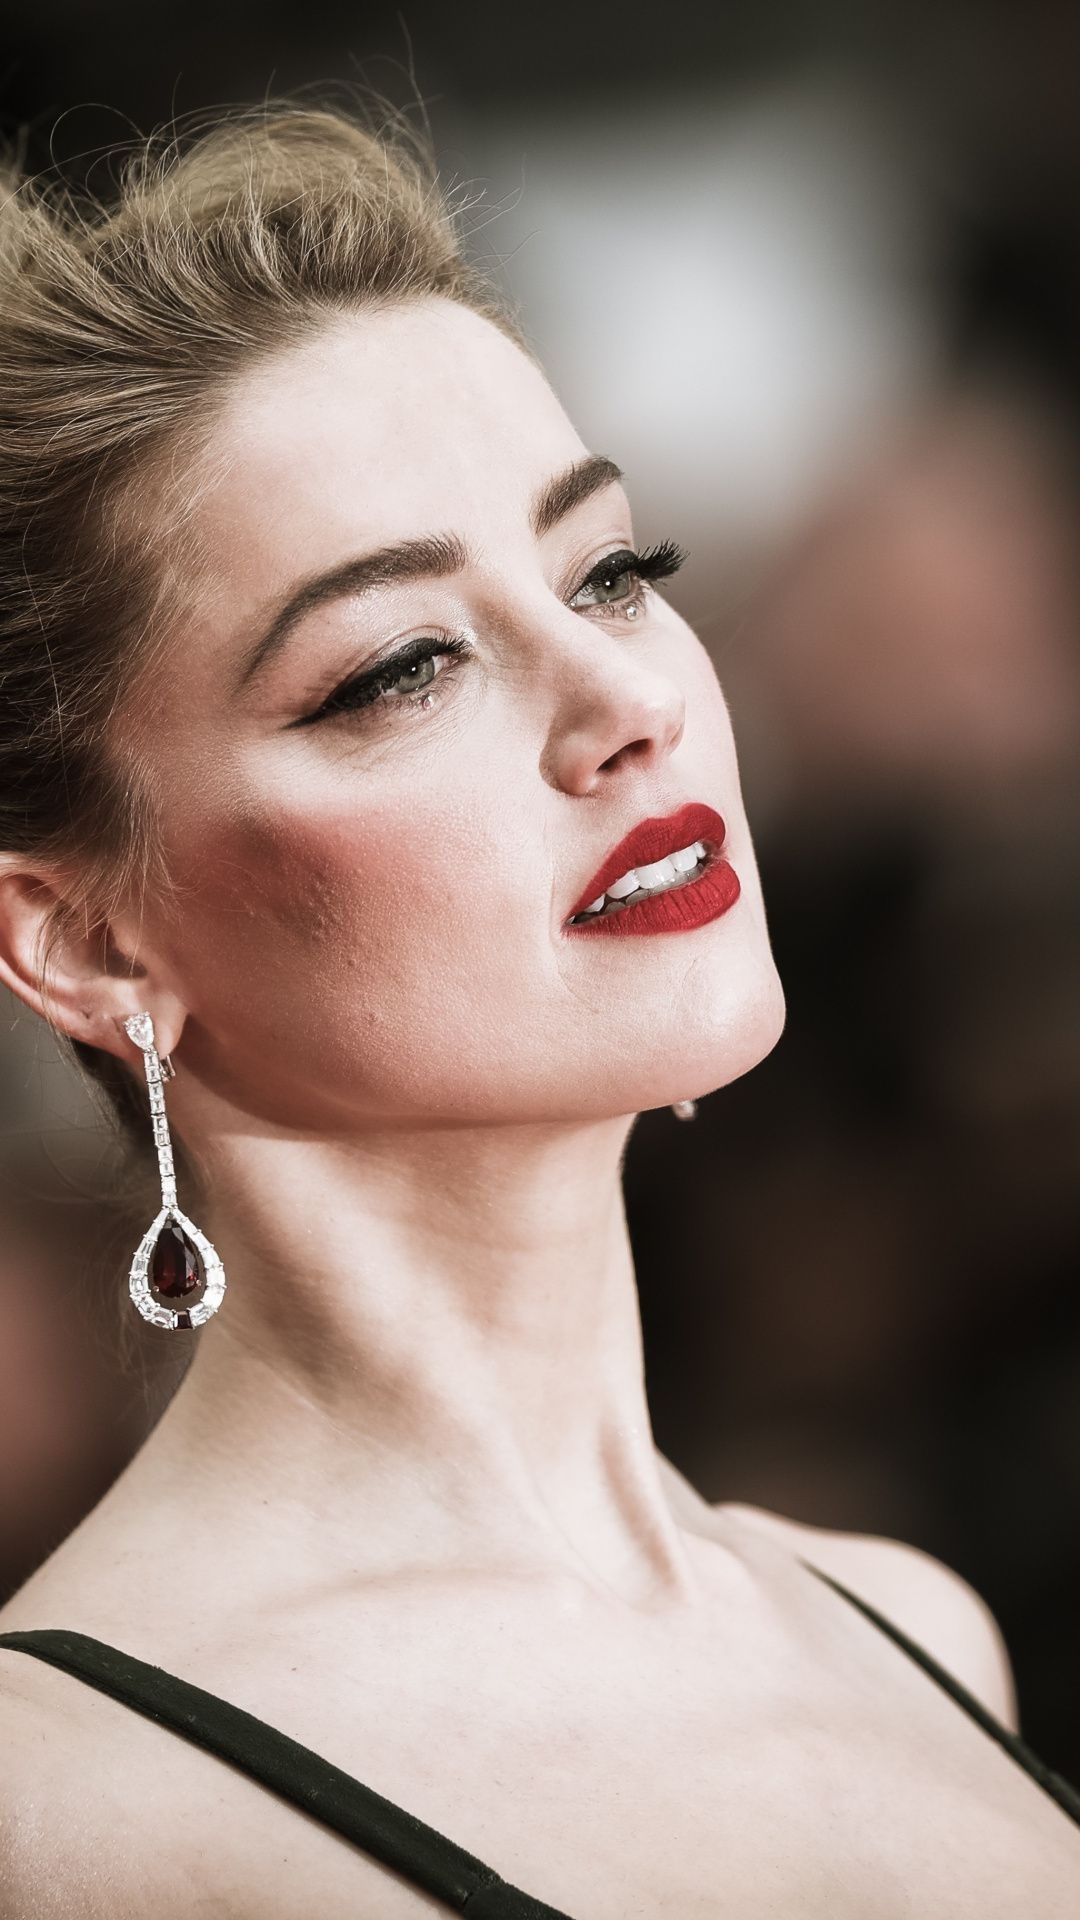 Celebrity Amber Heard Red Lips 2018 1080x1920 Wallpaper Amber Heard Wallpaper Amber Heard Amber